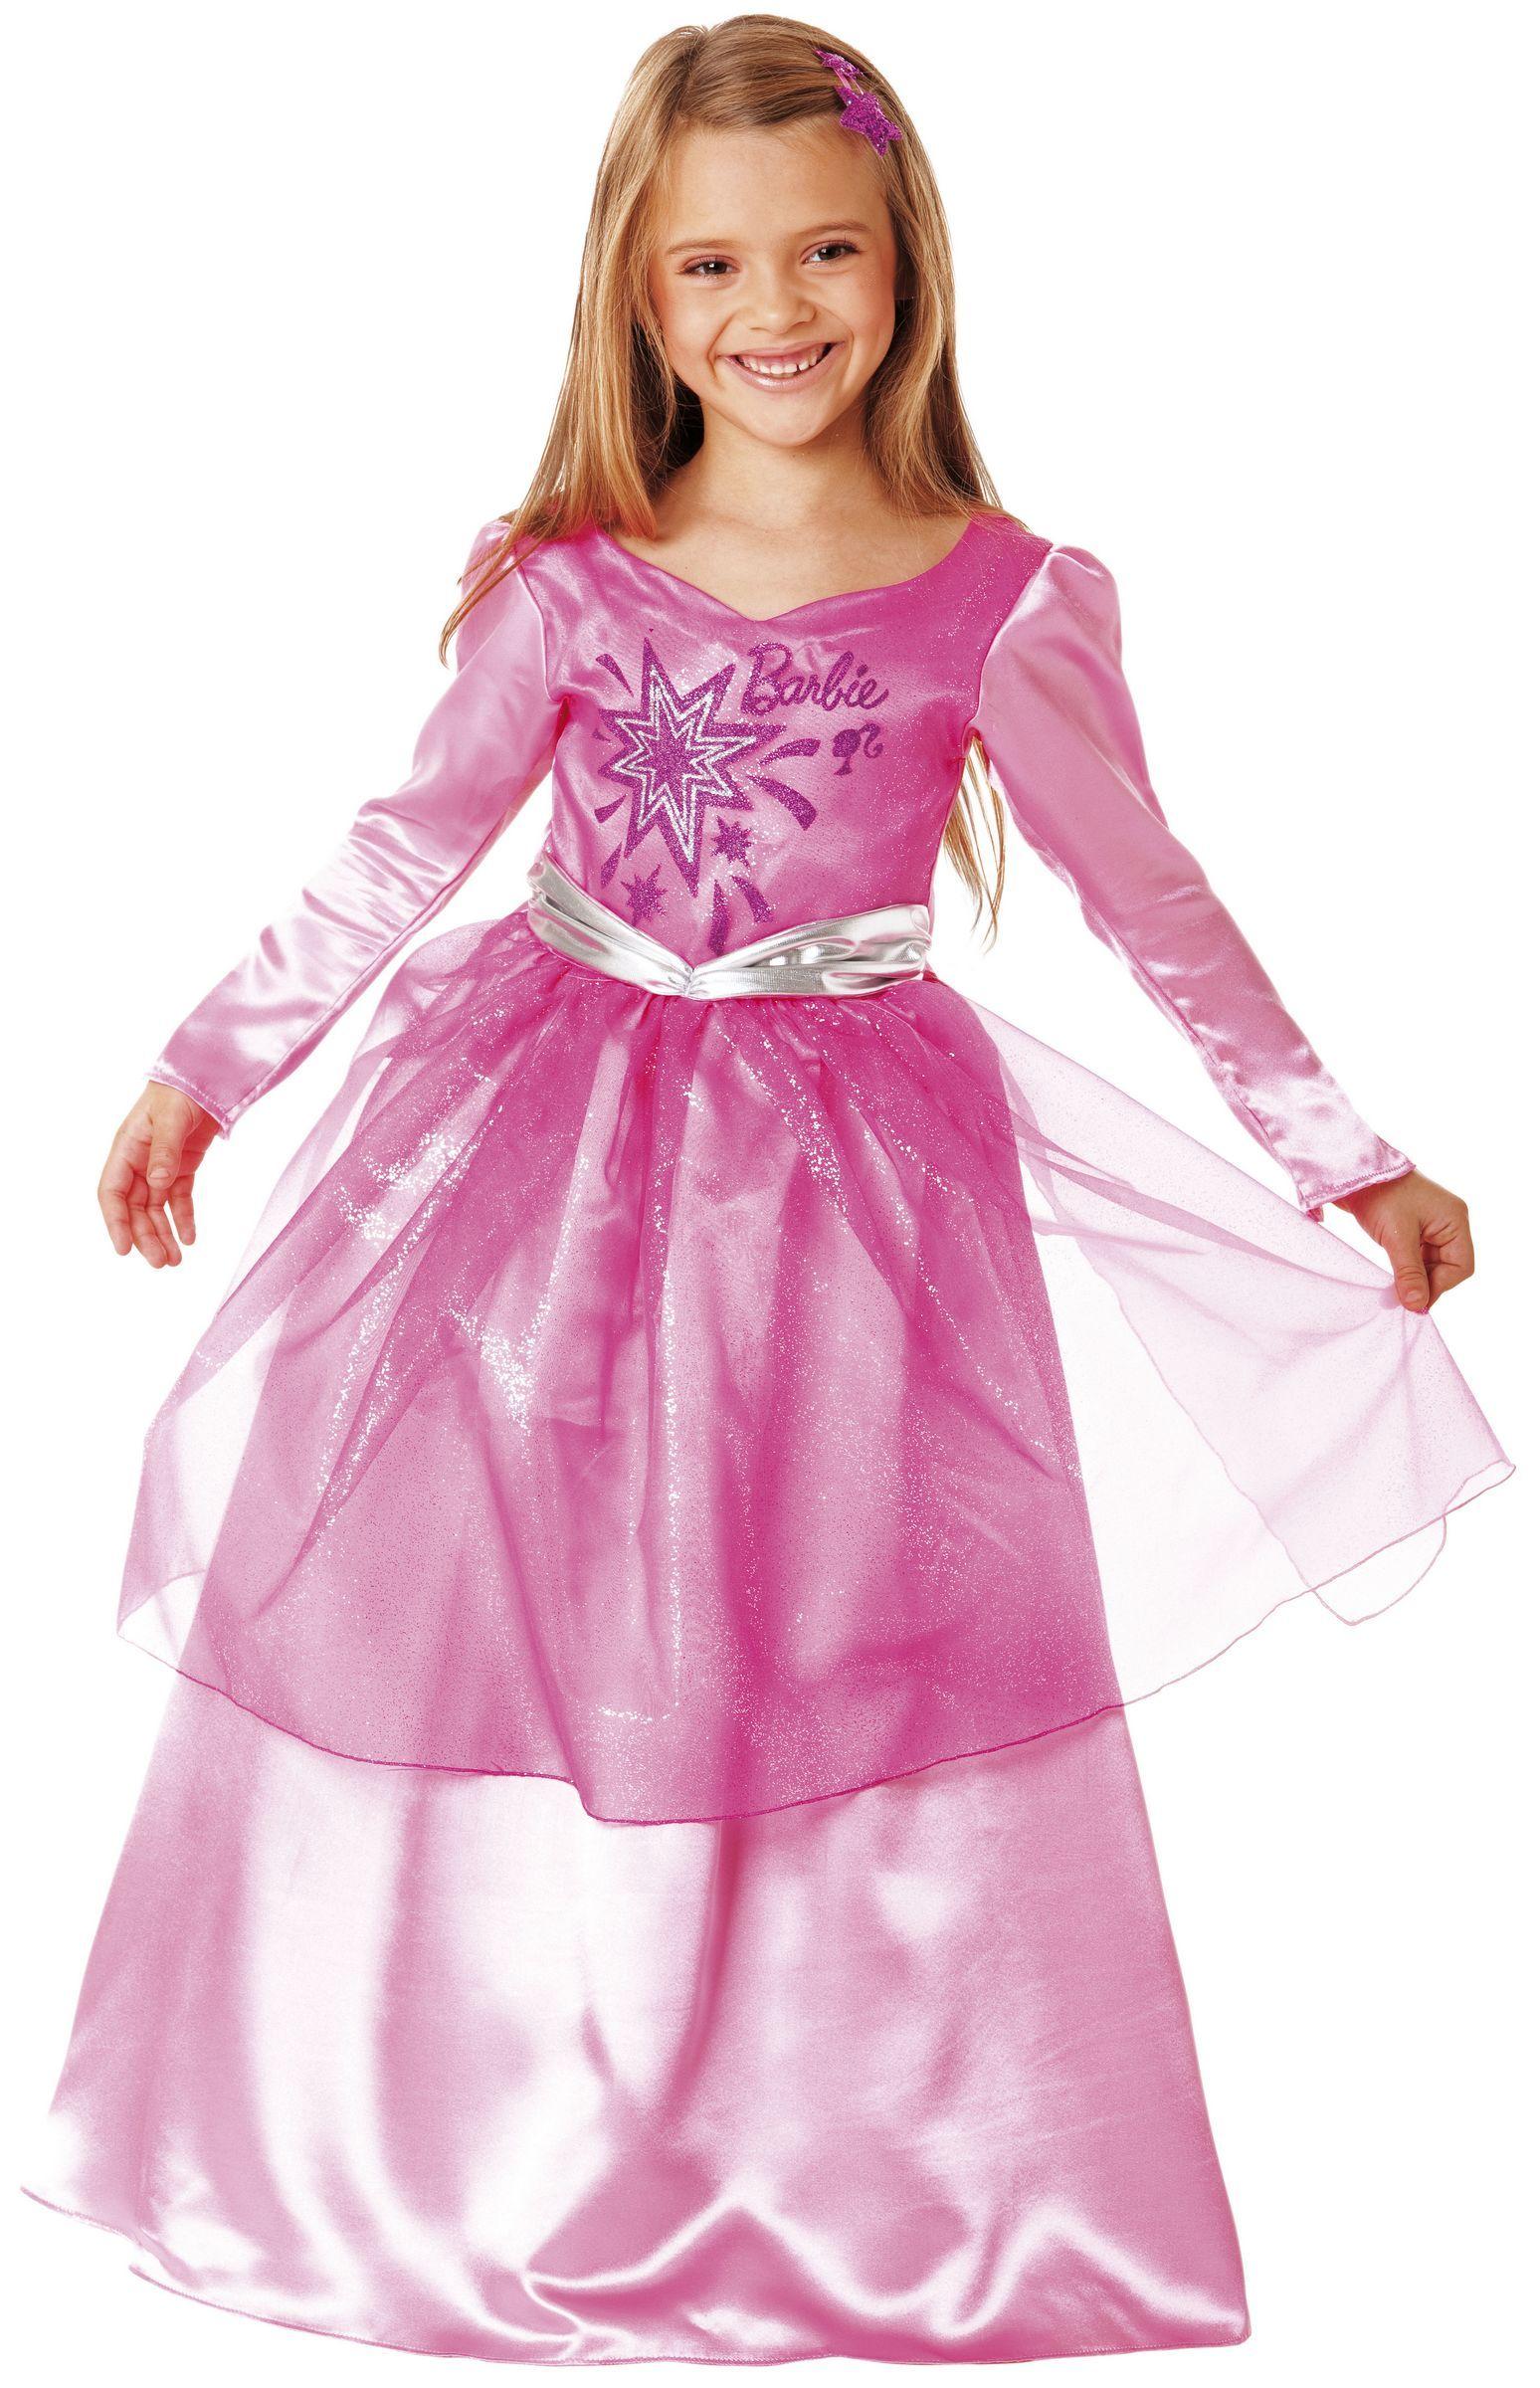 Disfraz de princesa Barbie™ para niña : Vegaoo, compra de Disfraces ...